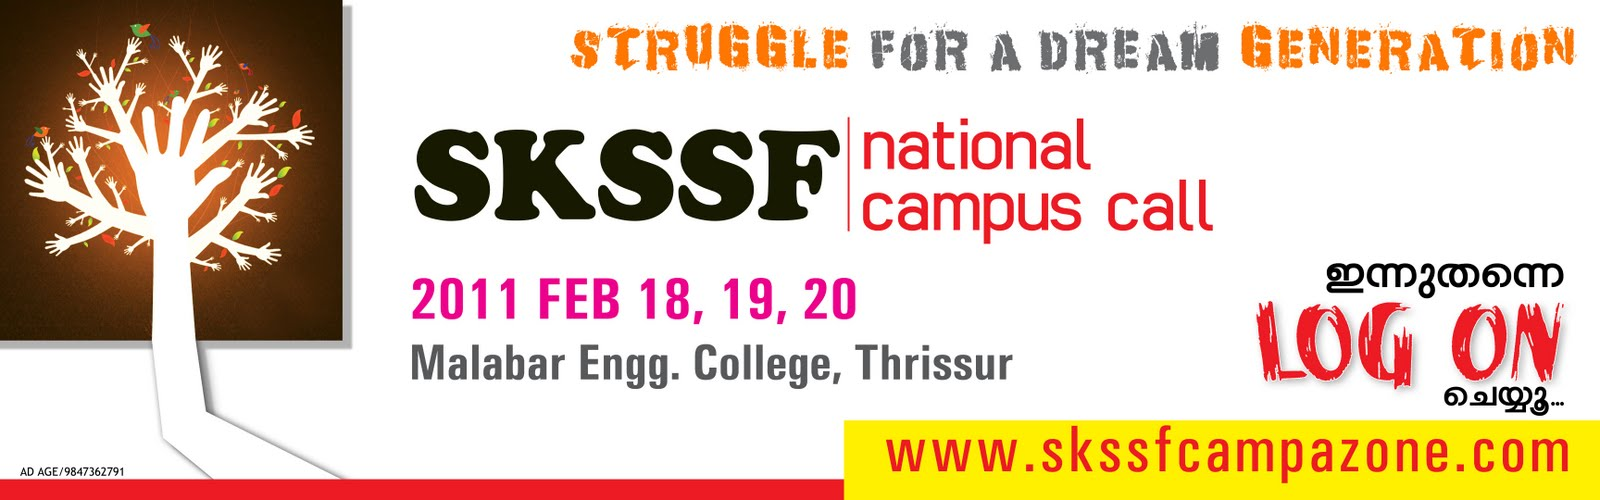 SKSSF Campus Wing Trivandrum Zone